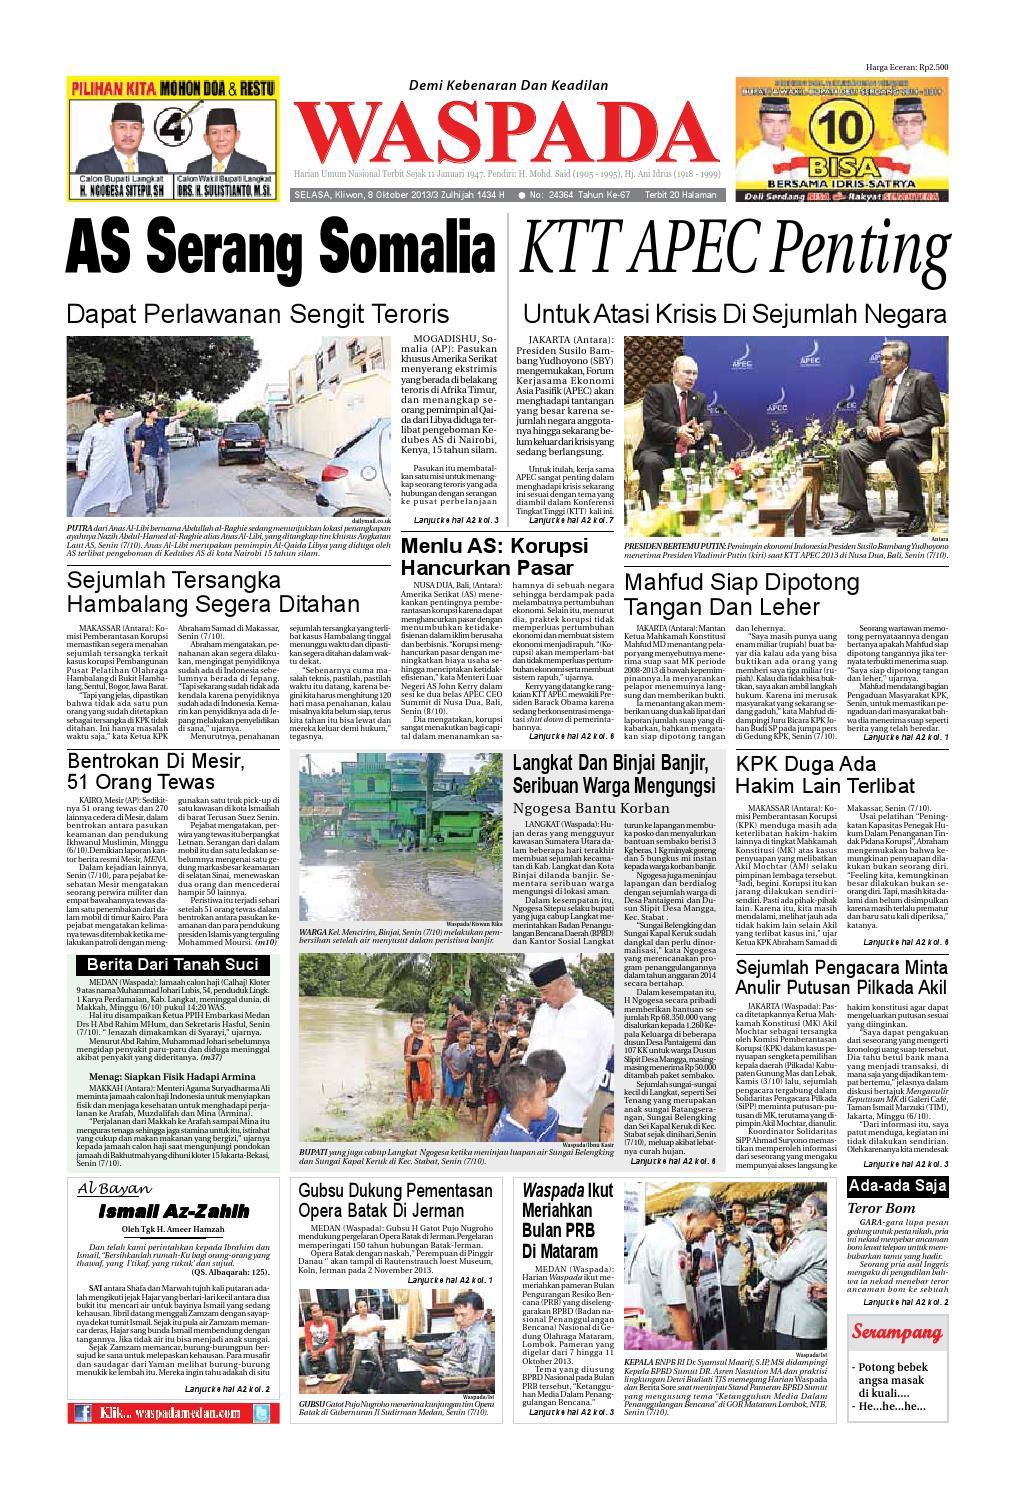 Waspadaselasa 8 Oktober 2013 By Harian Waspada Issuu Kopibubuk Robusta Toko Rezeki Akumandiri Malang